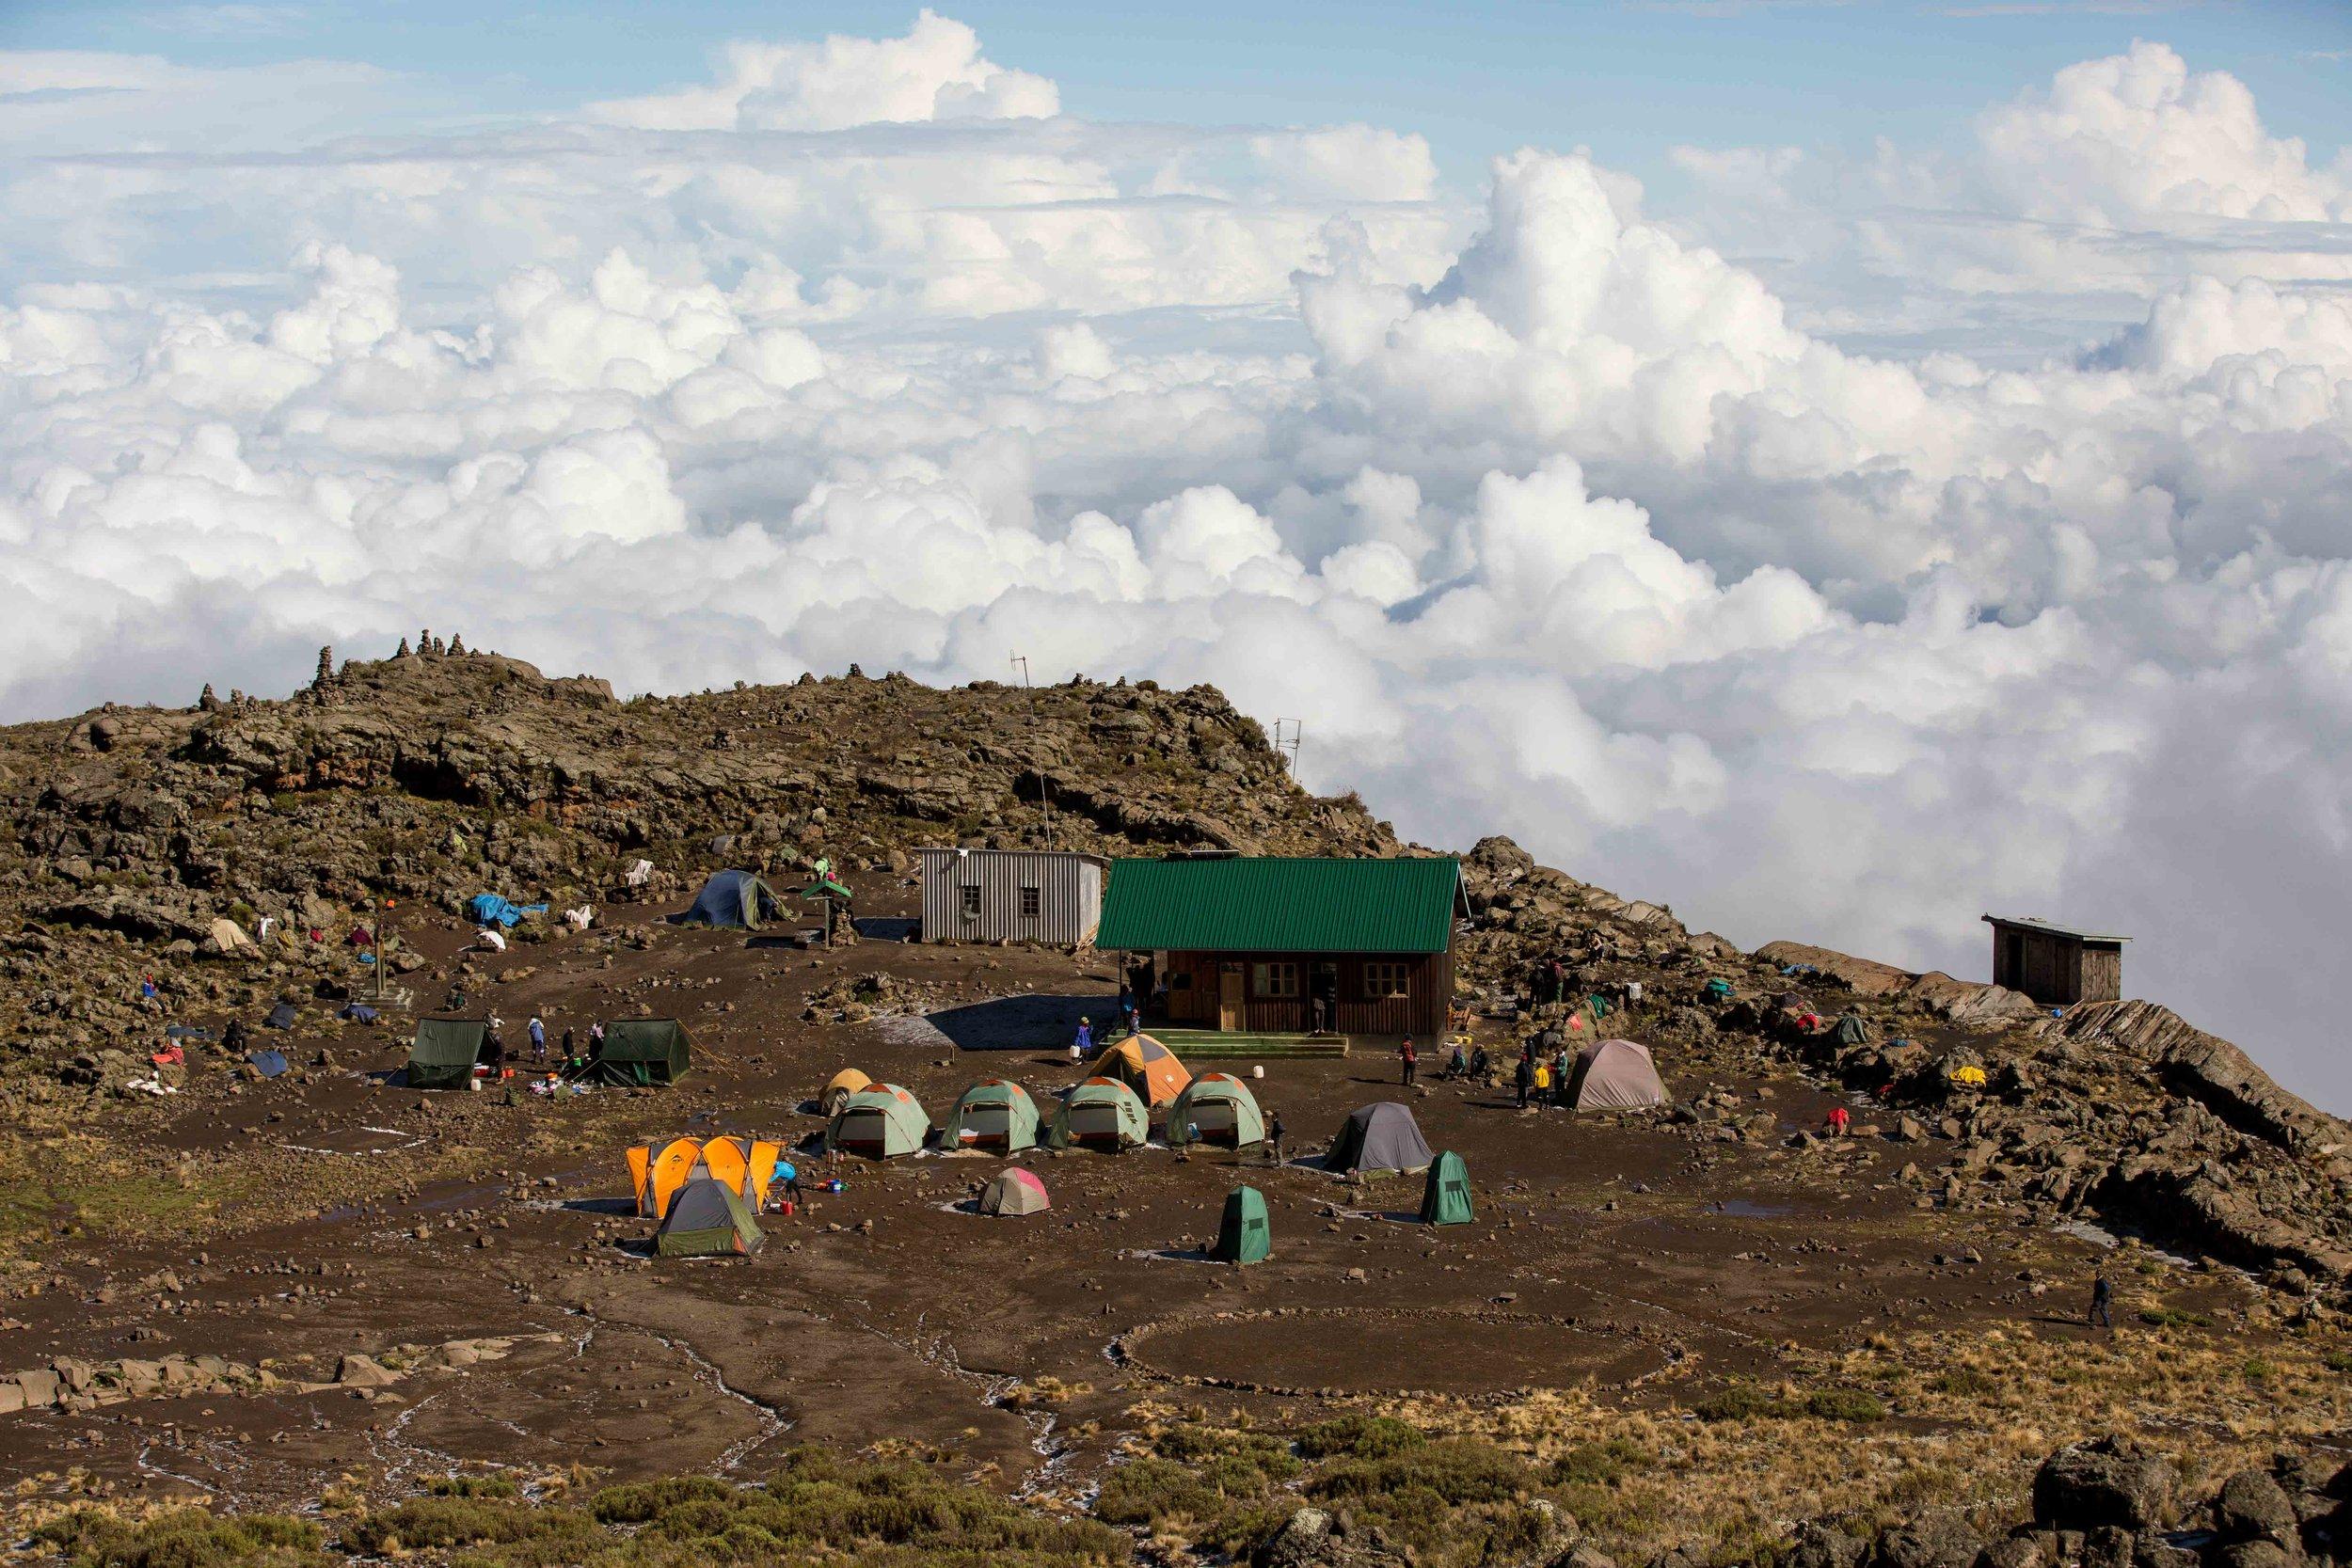 ajw_REI_Kilimanjaro-25.jpg